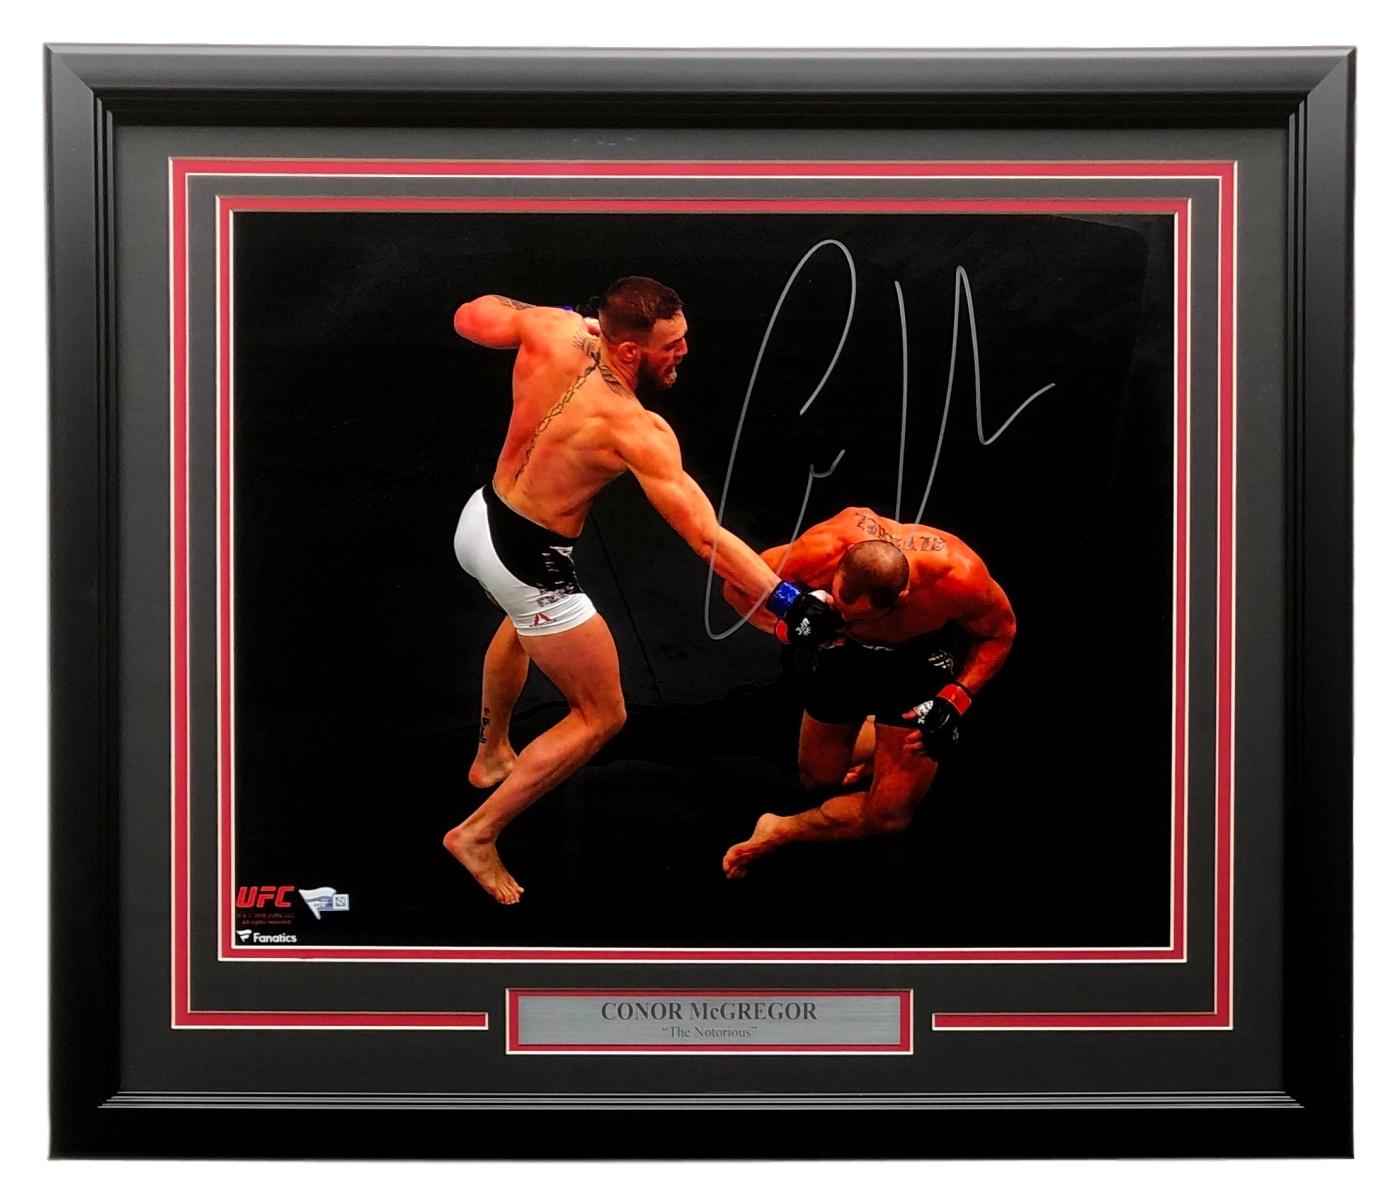 Conor McGregor Signed Framed UFC Double Champ 16x20 Photo Fanatics